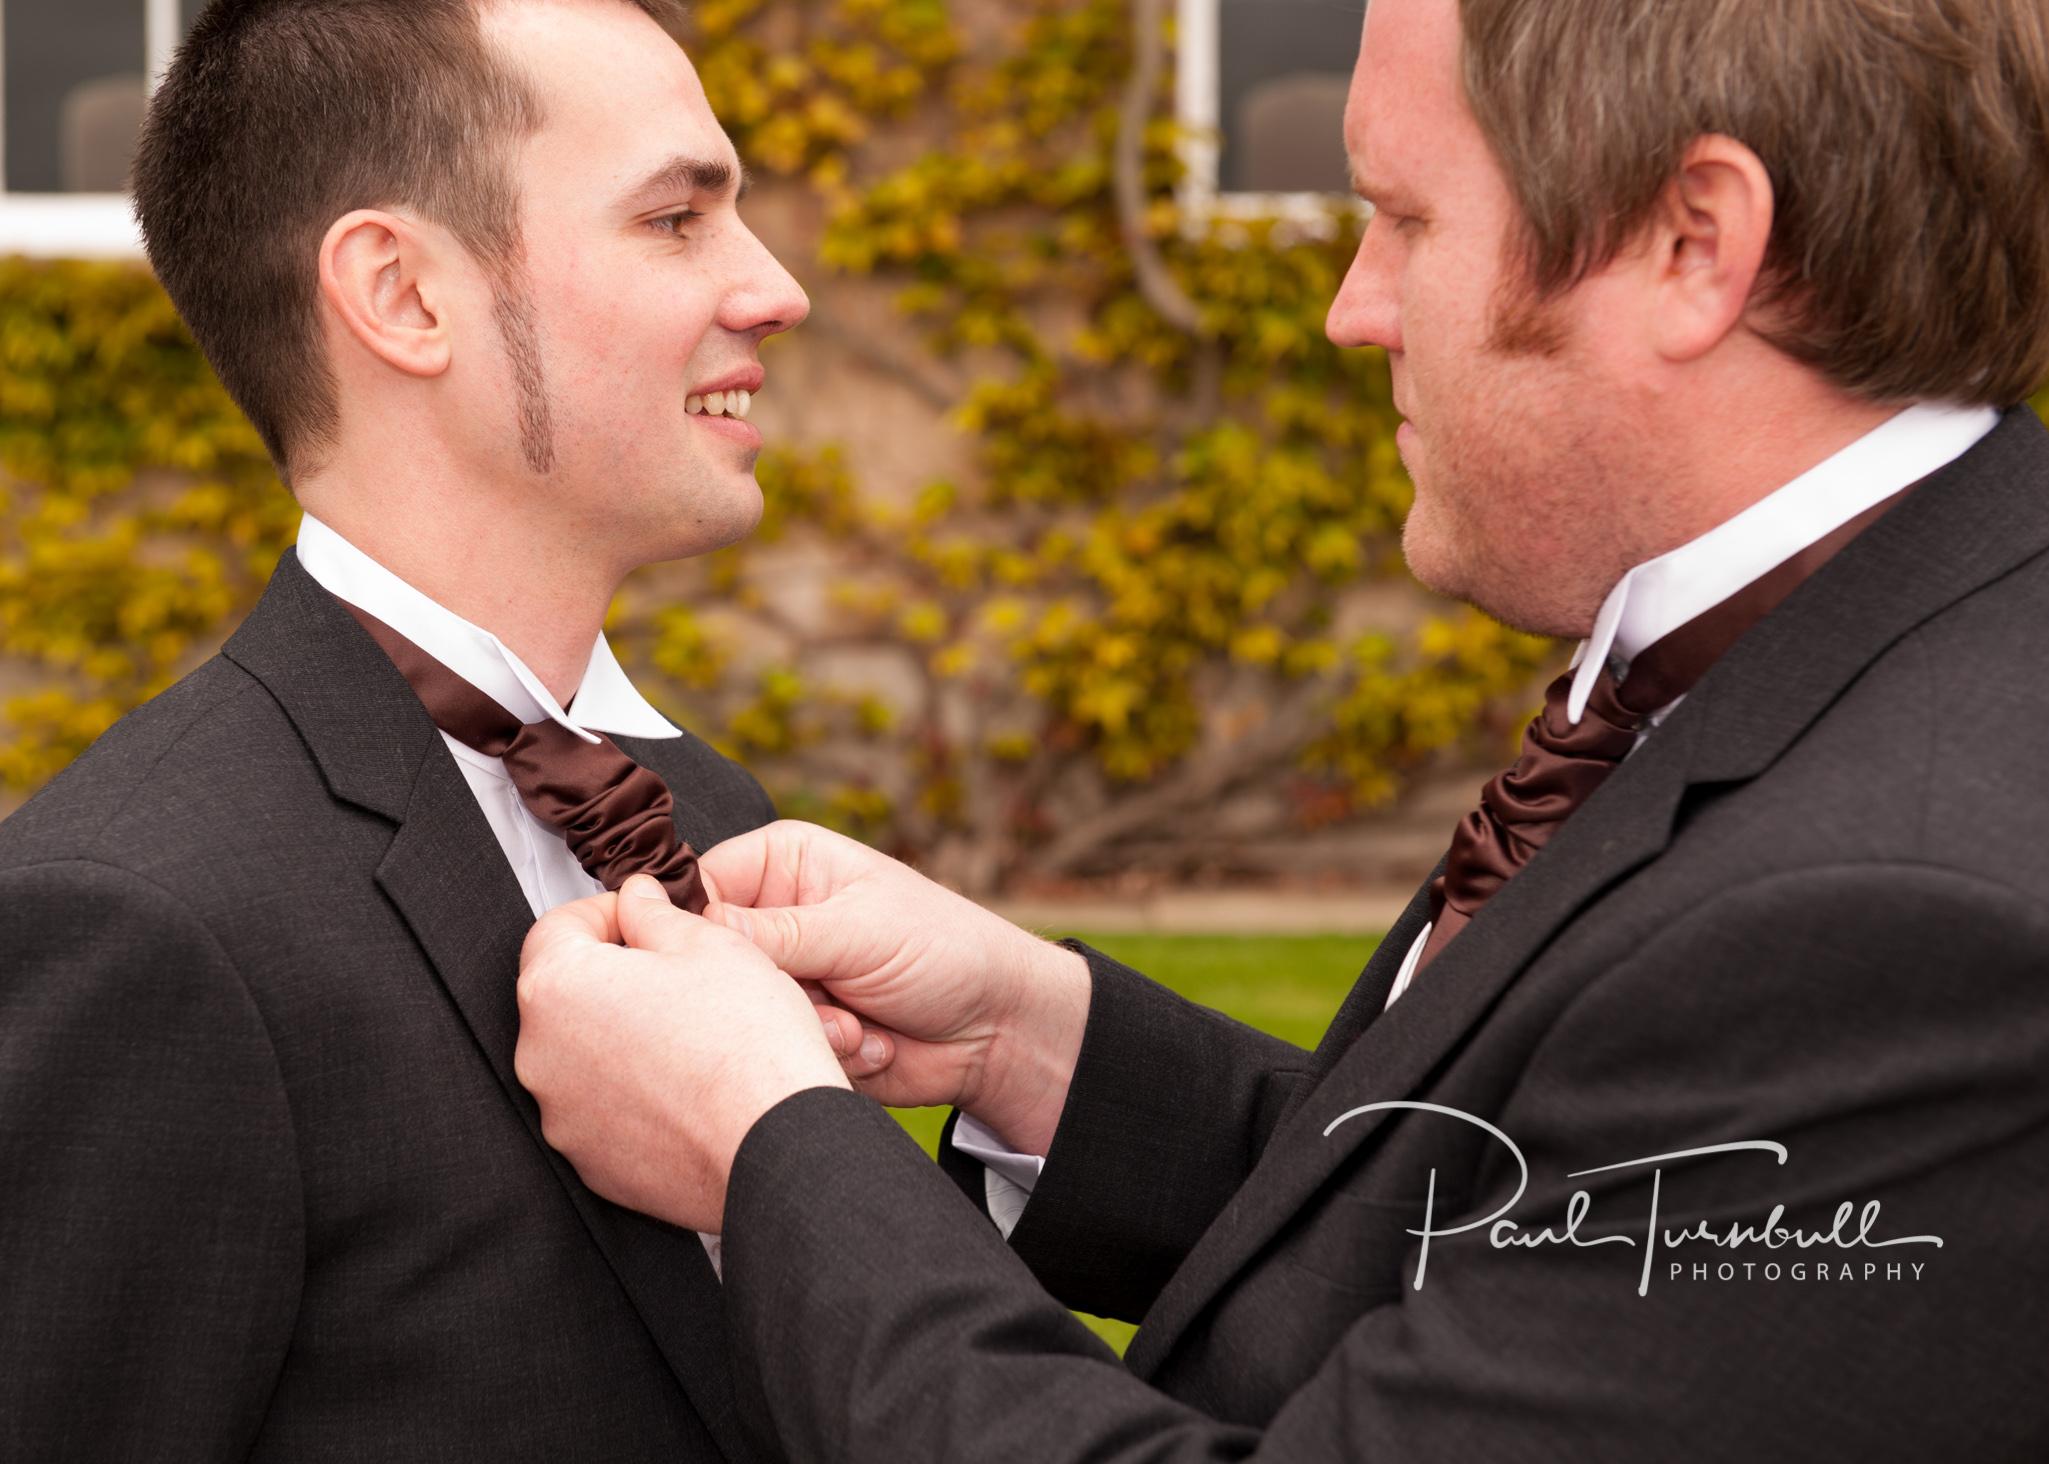 wedding-photography-wood-hall-wetherby-yorkshire-011.jpg